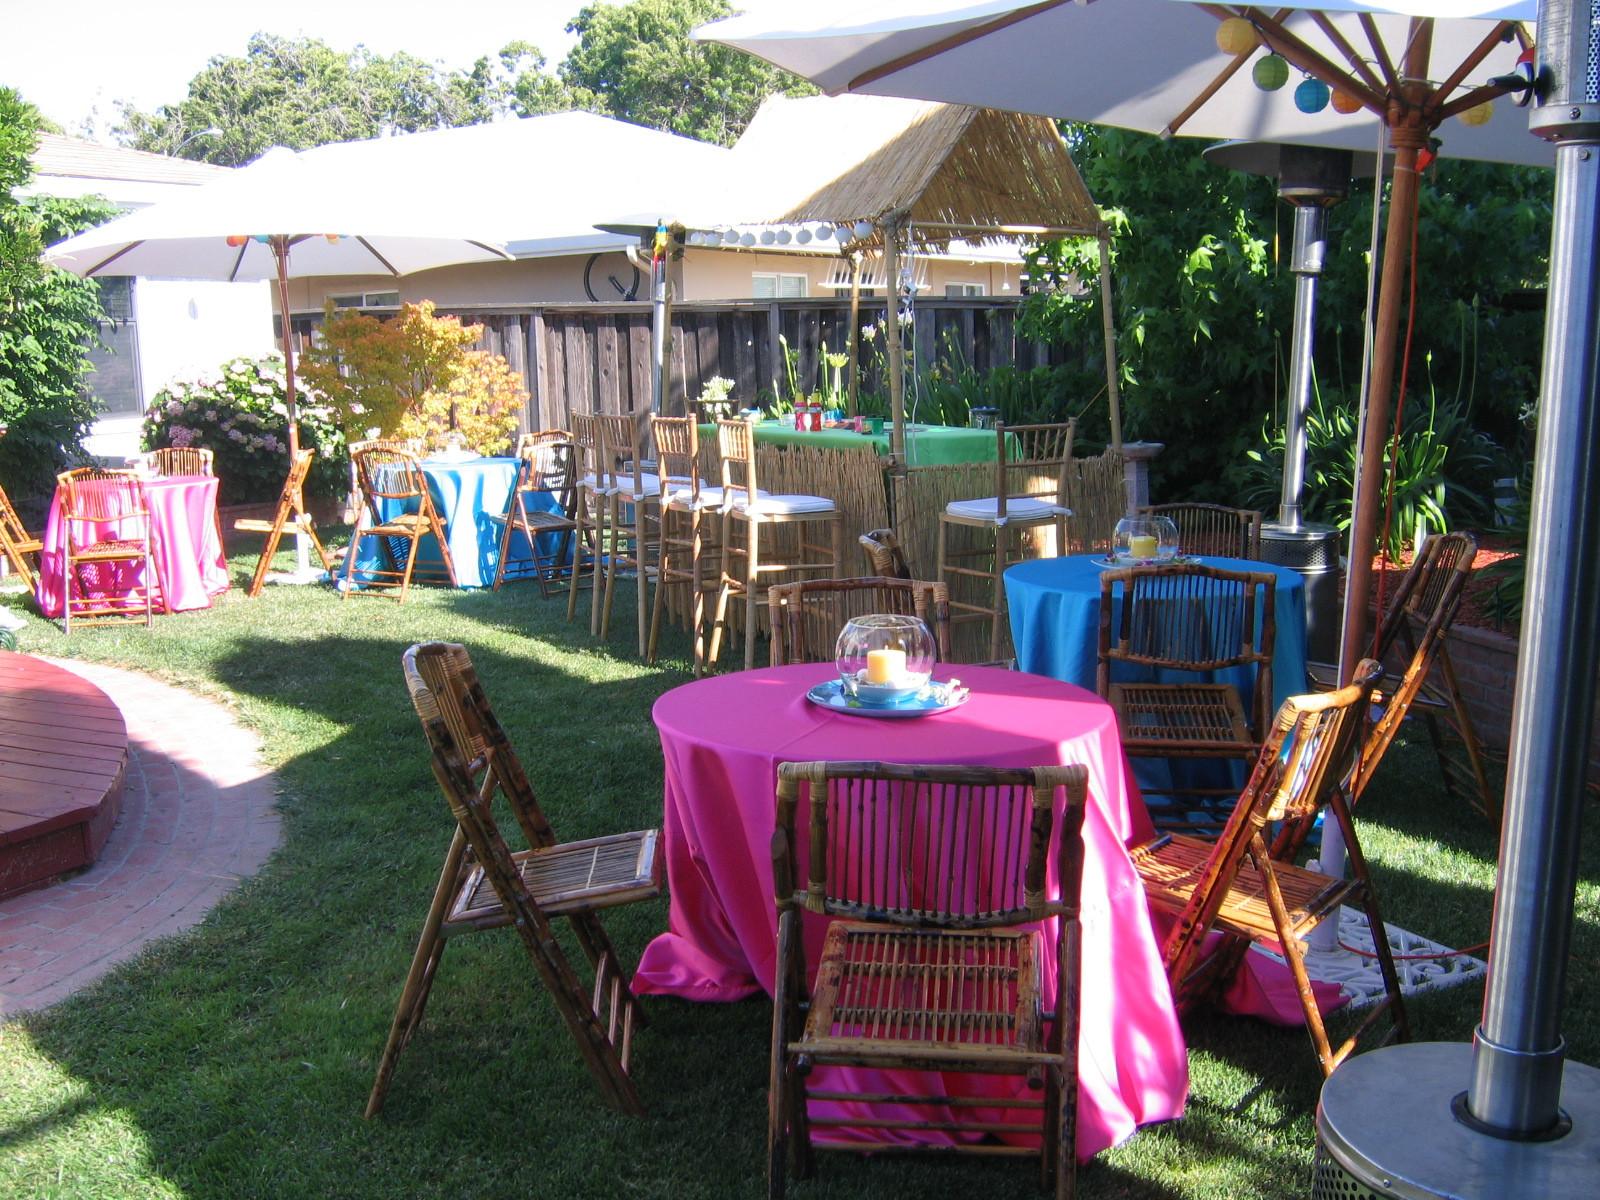 Hawaiian Backyard Party Ideas  In style party favors